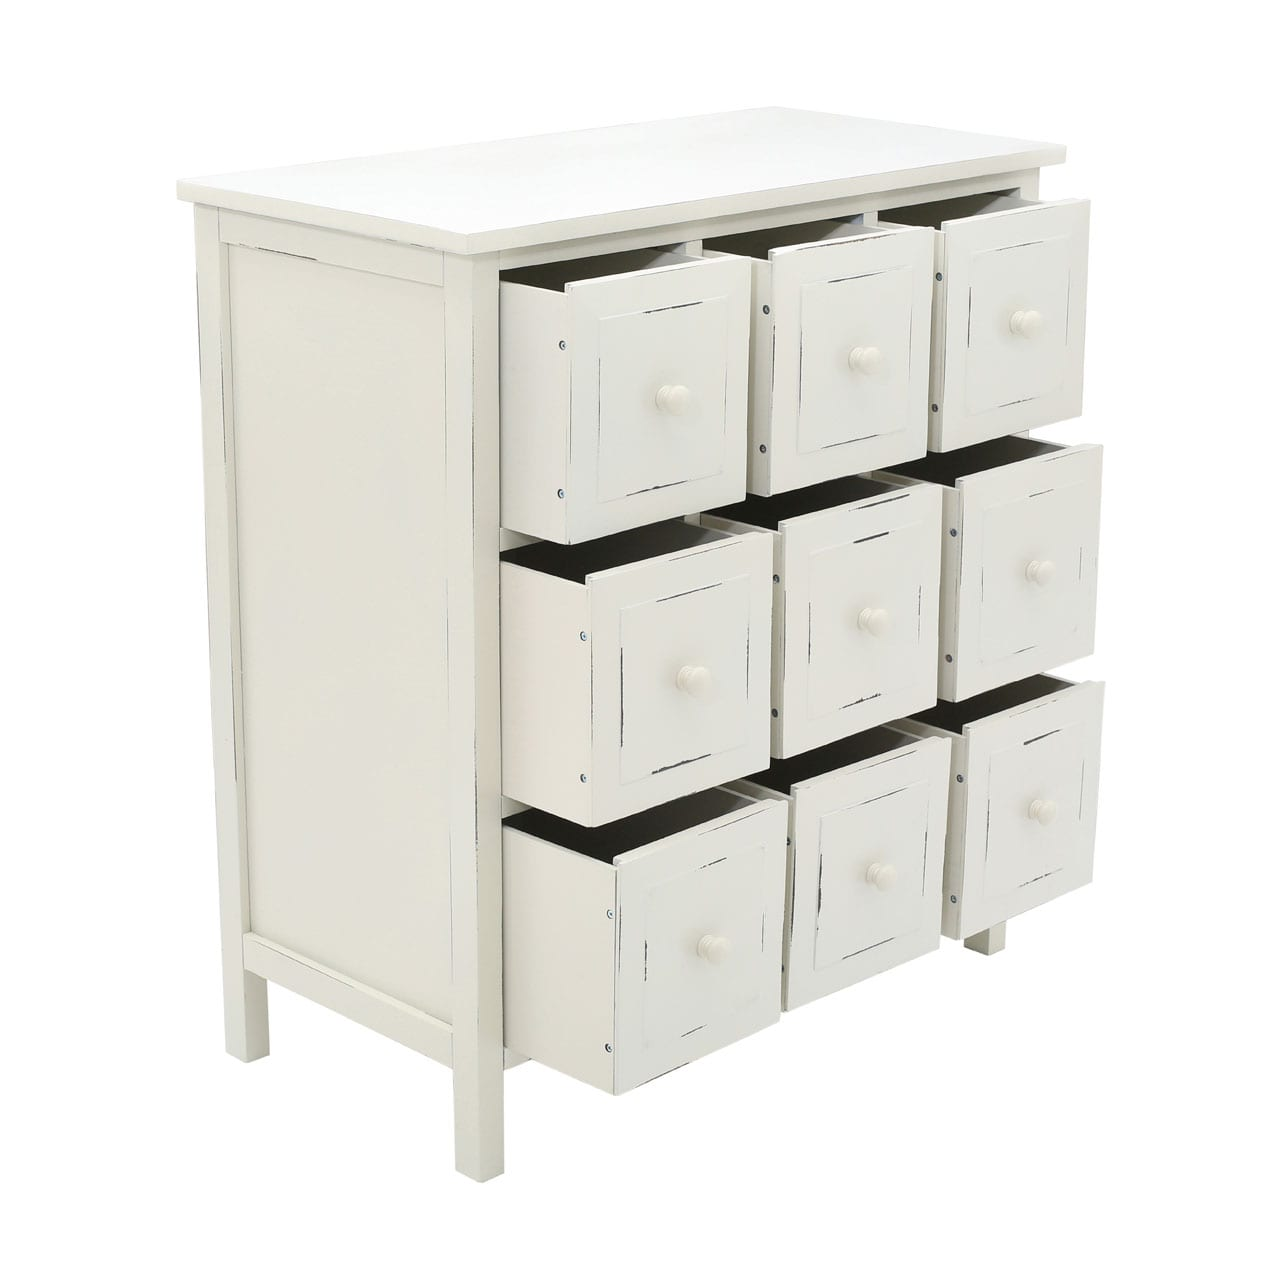 Grenoble 9 Drawer Cabinet